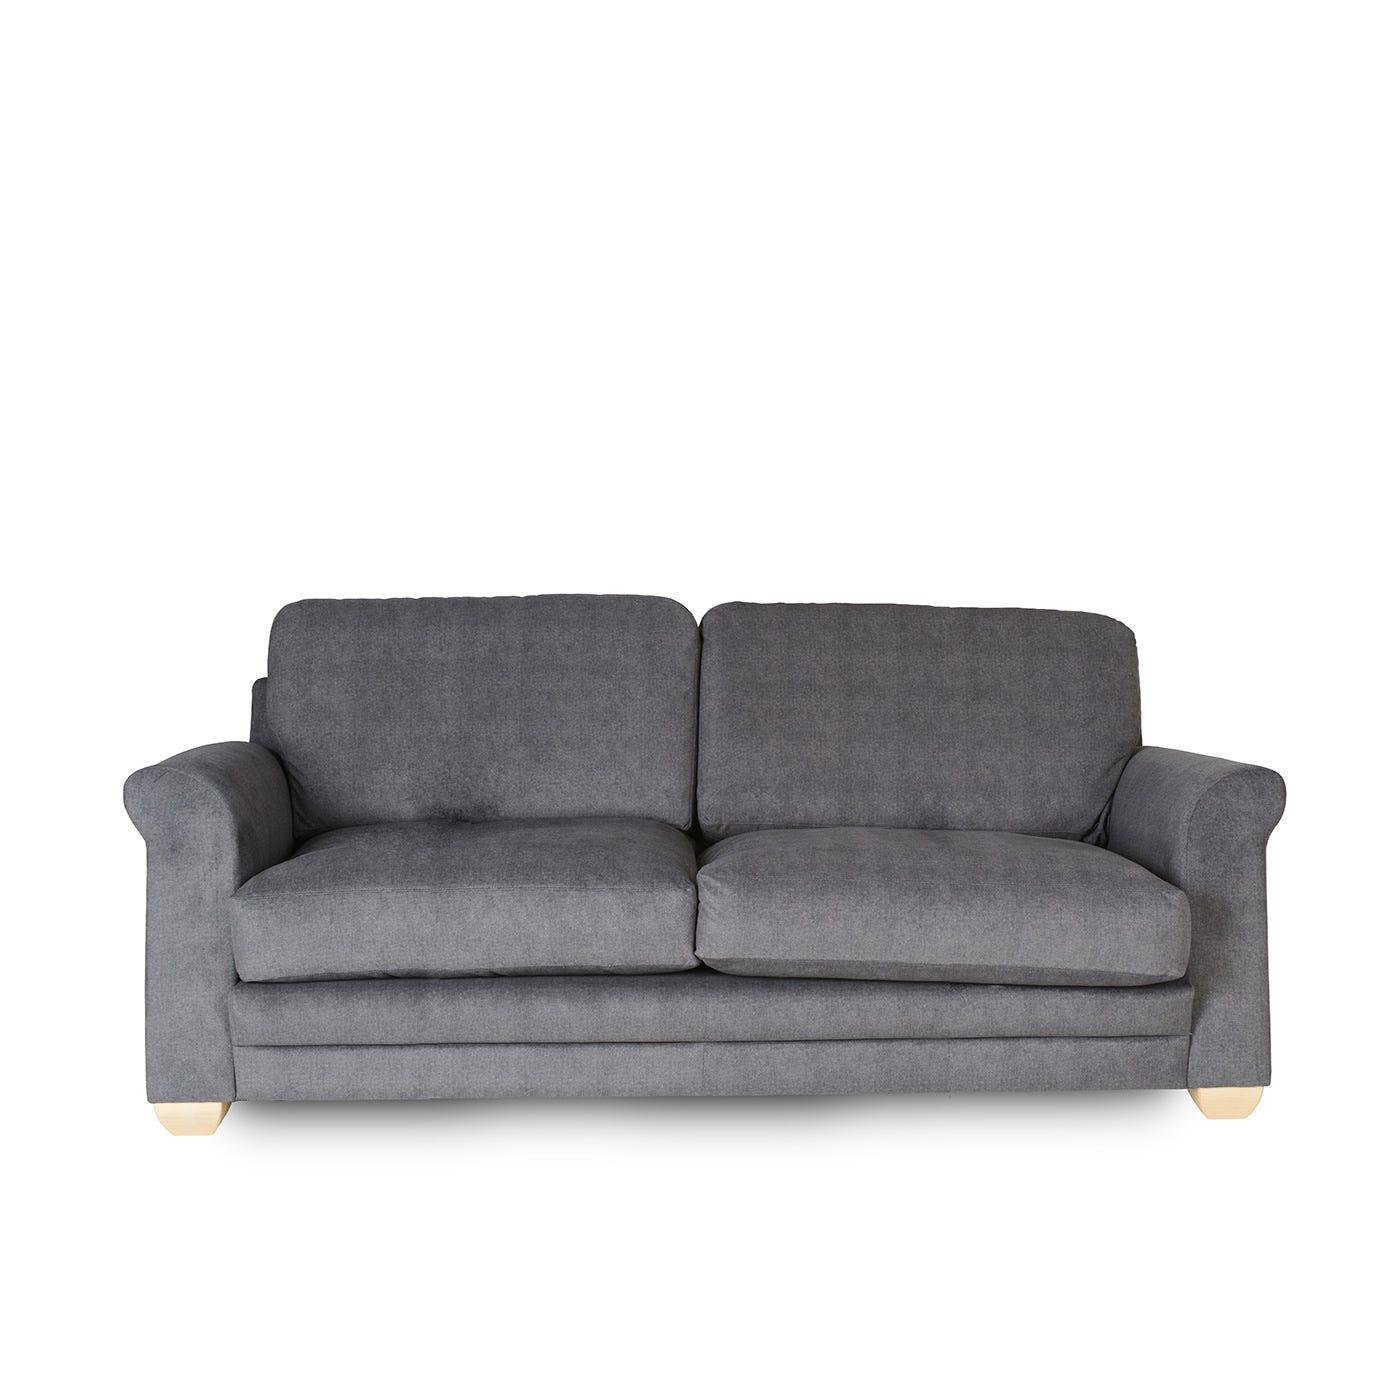 Padstow 3 seat sofa fabric Malta Carbon